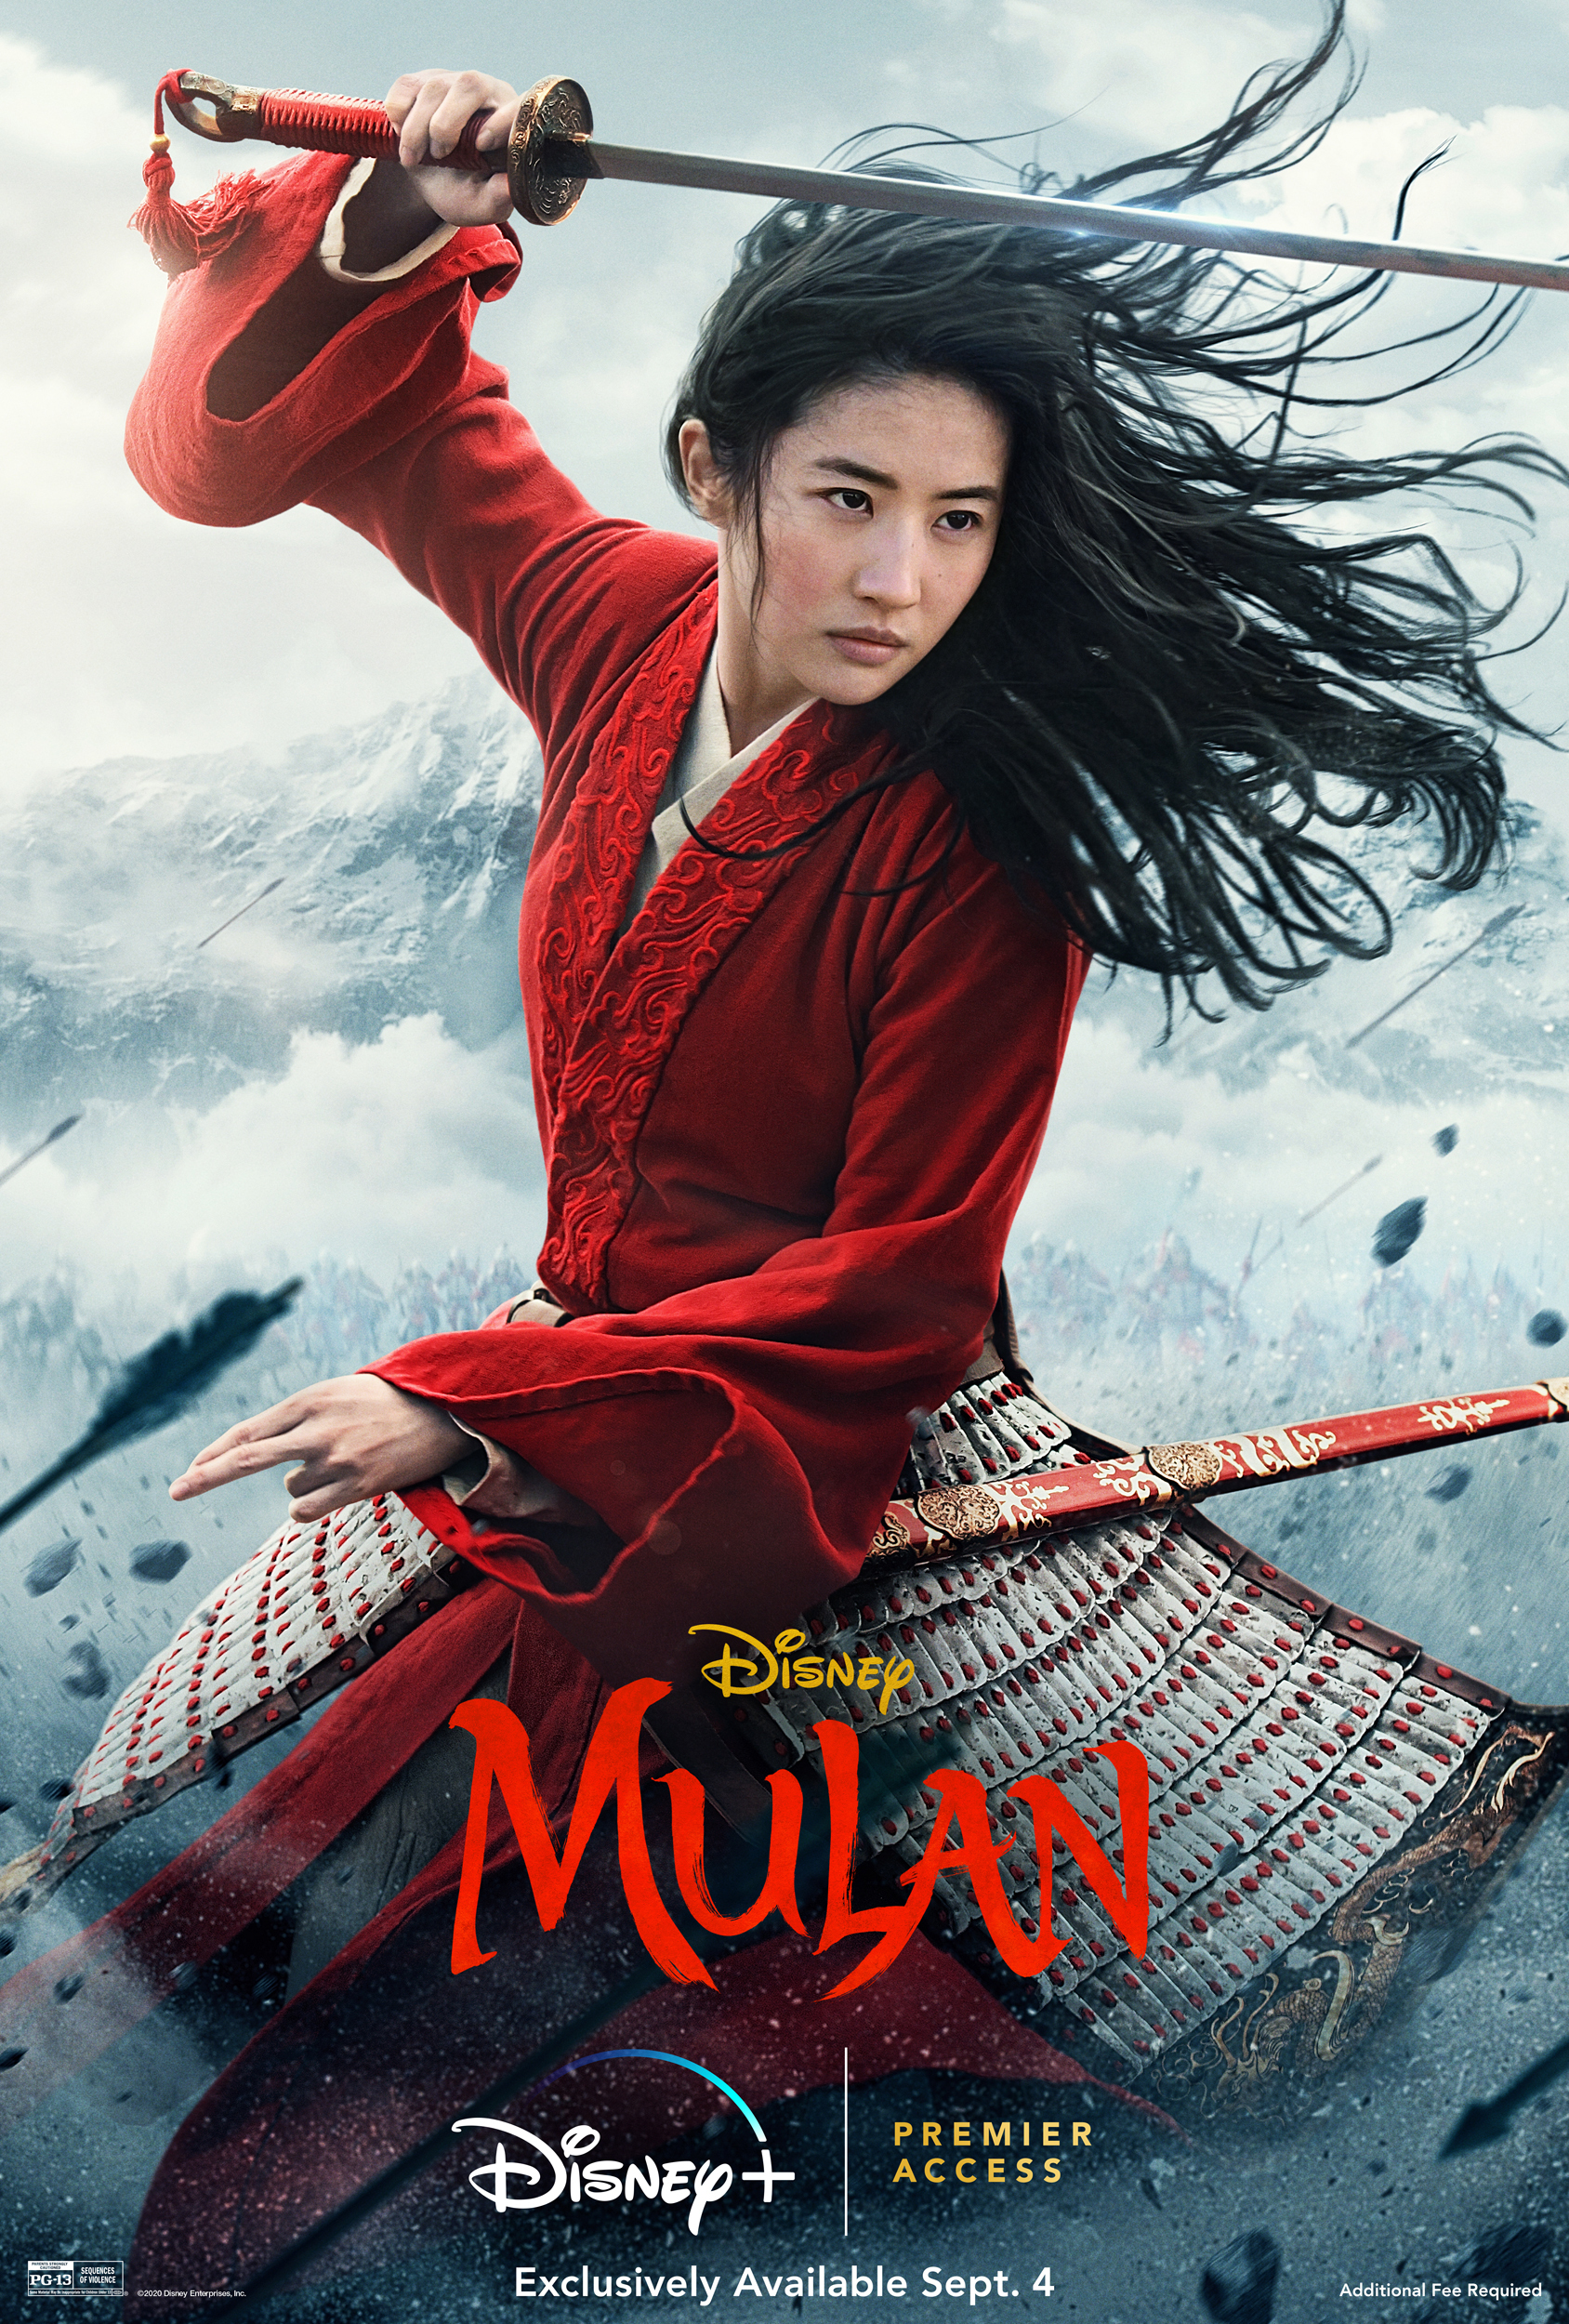 Disney's Mulan Movie Review